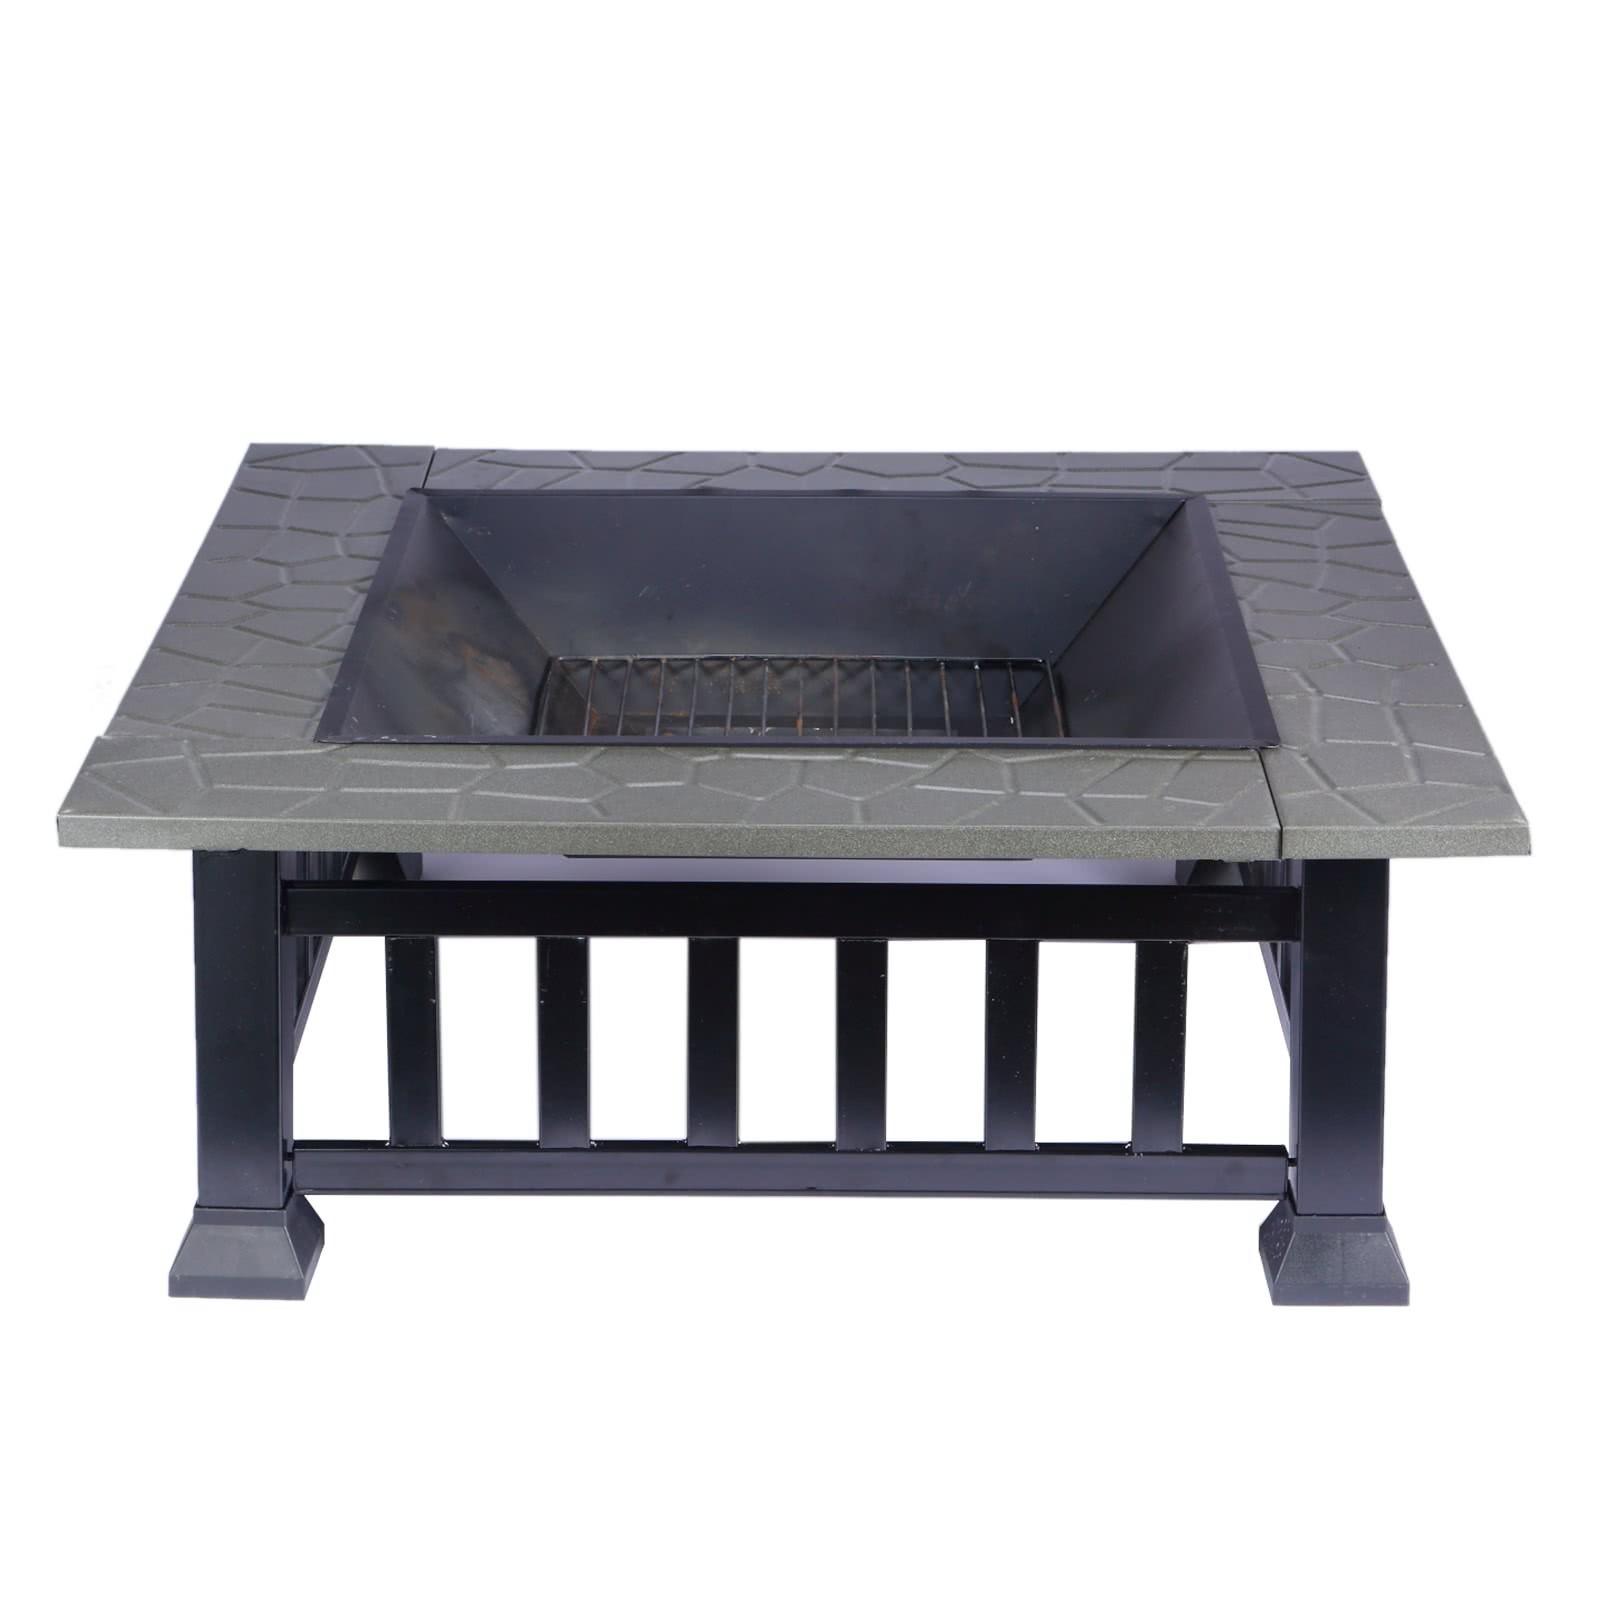 feuerschale multifunktional feuerstelle fire pit f r. Black Bedroom Furniture Sets. Home Design Ideas